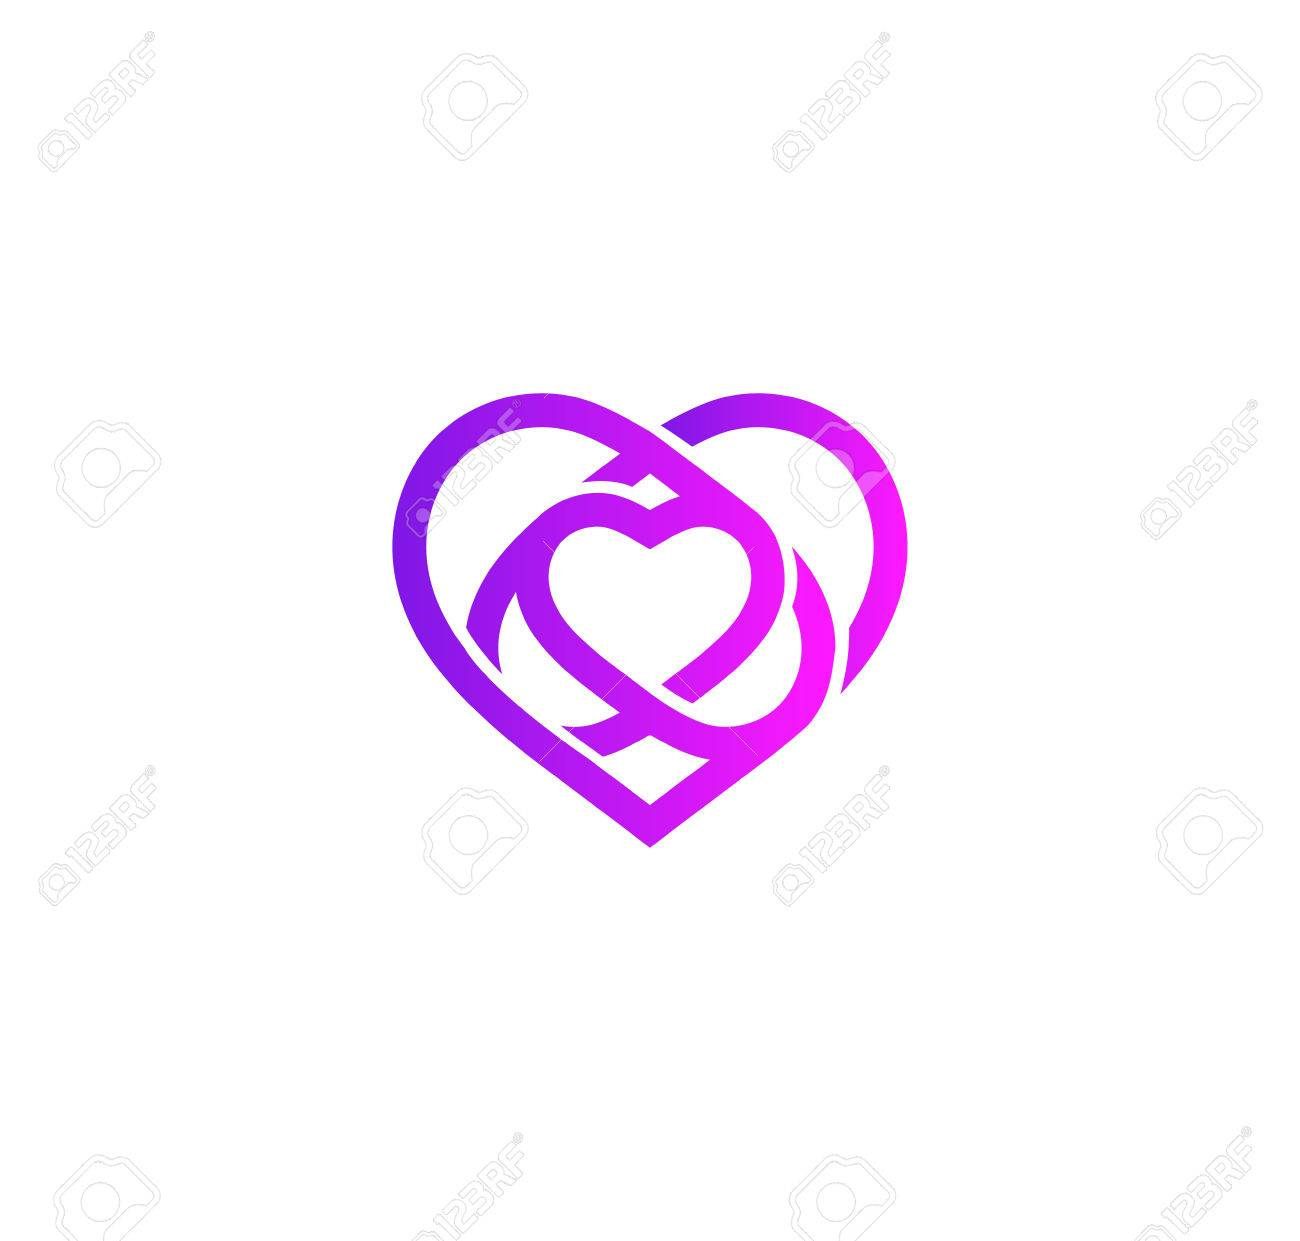 isolated purple abstract monoline heart logo love logotypes rh 123rf com wedding heart cookies Wedding Heart Silhouette